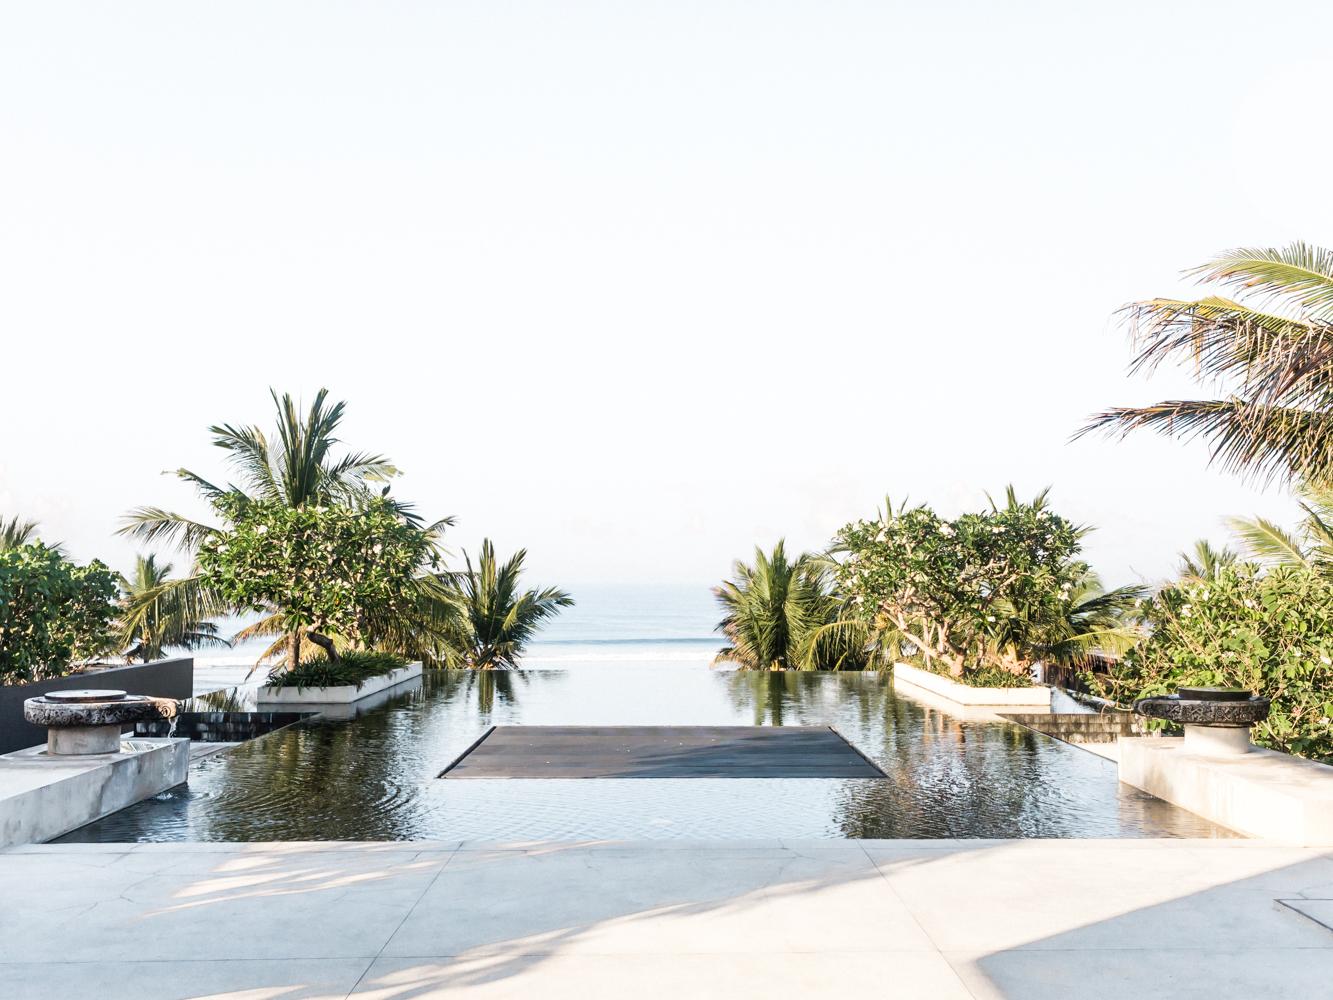 Bali_Real_Wedding_(c)_Rory_Wylie-9.jpg